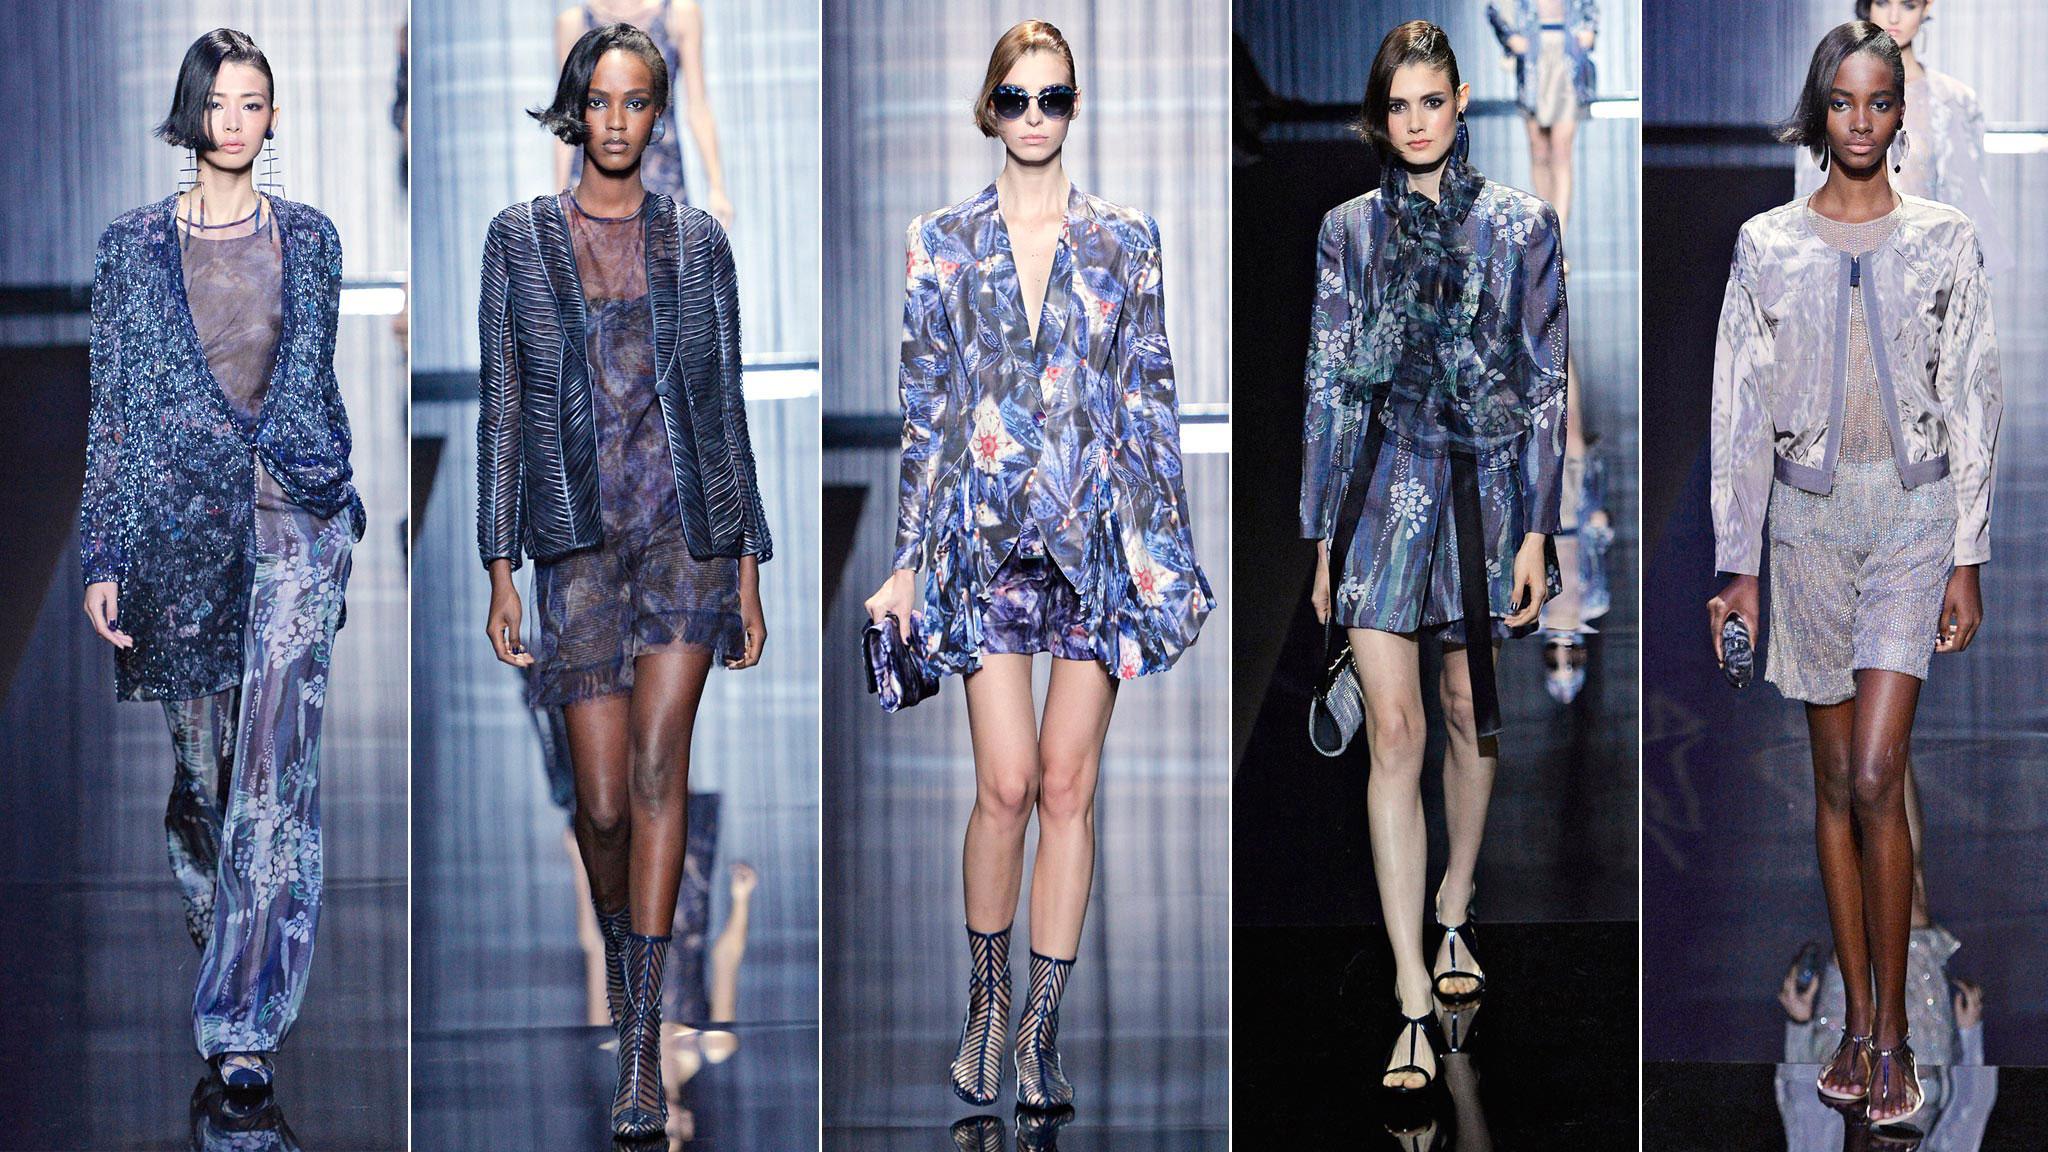 Giorgio Armani SS17 show report: Milan Fashion Week